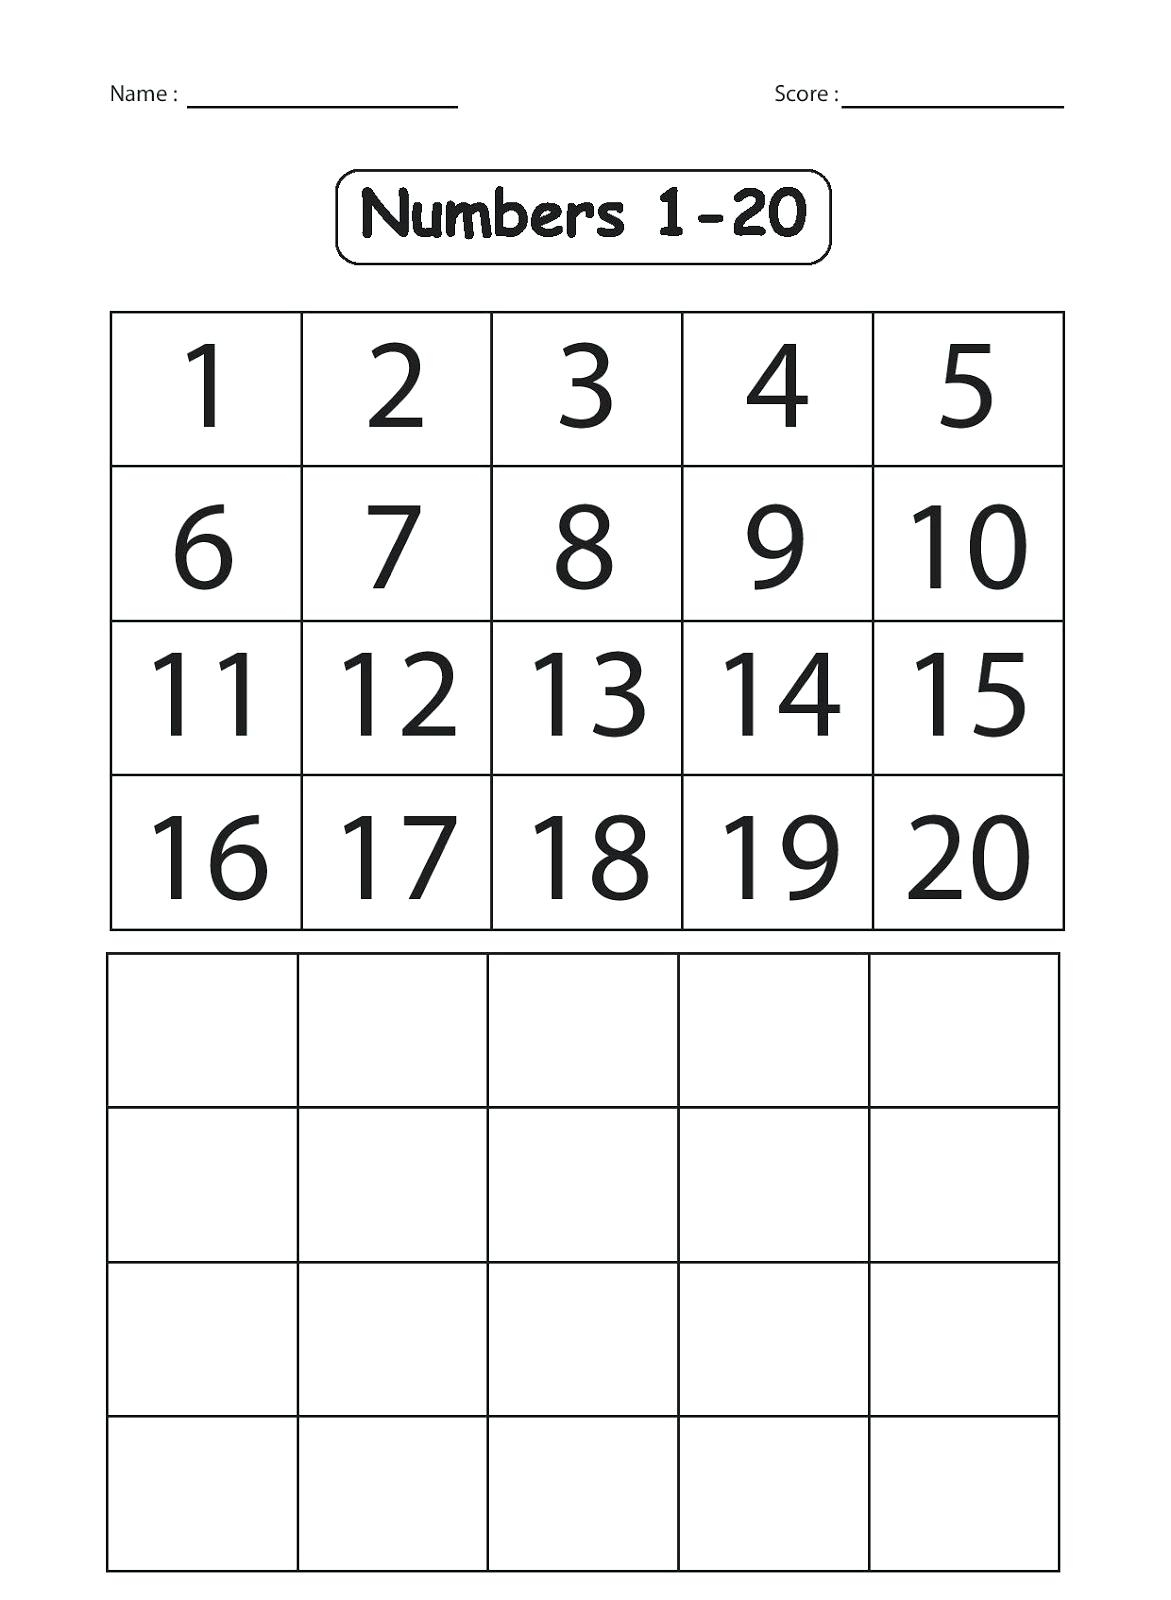 Kindergarten Number Worksheets 1 20 Worksheets Numbers 1 For - Free | Counting Worksheets 1 20 Printable